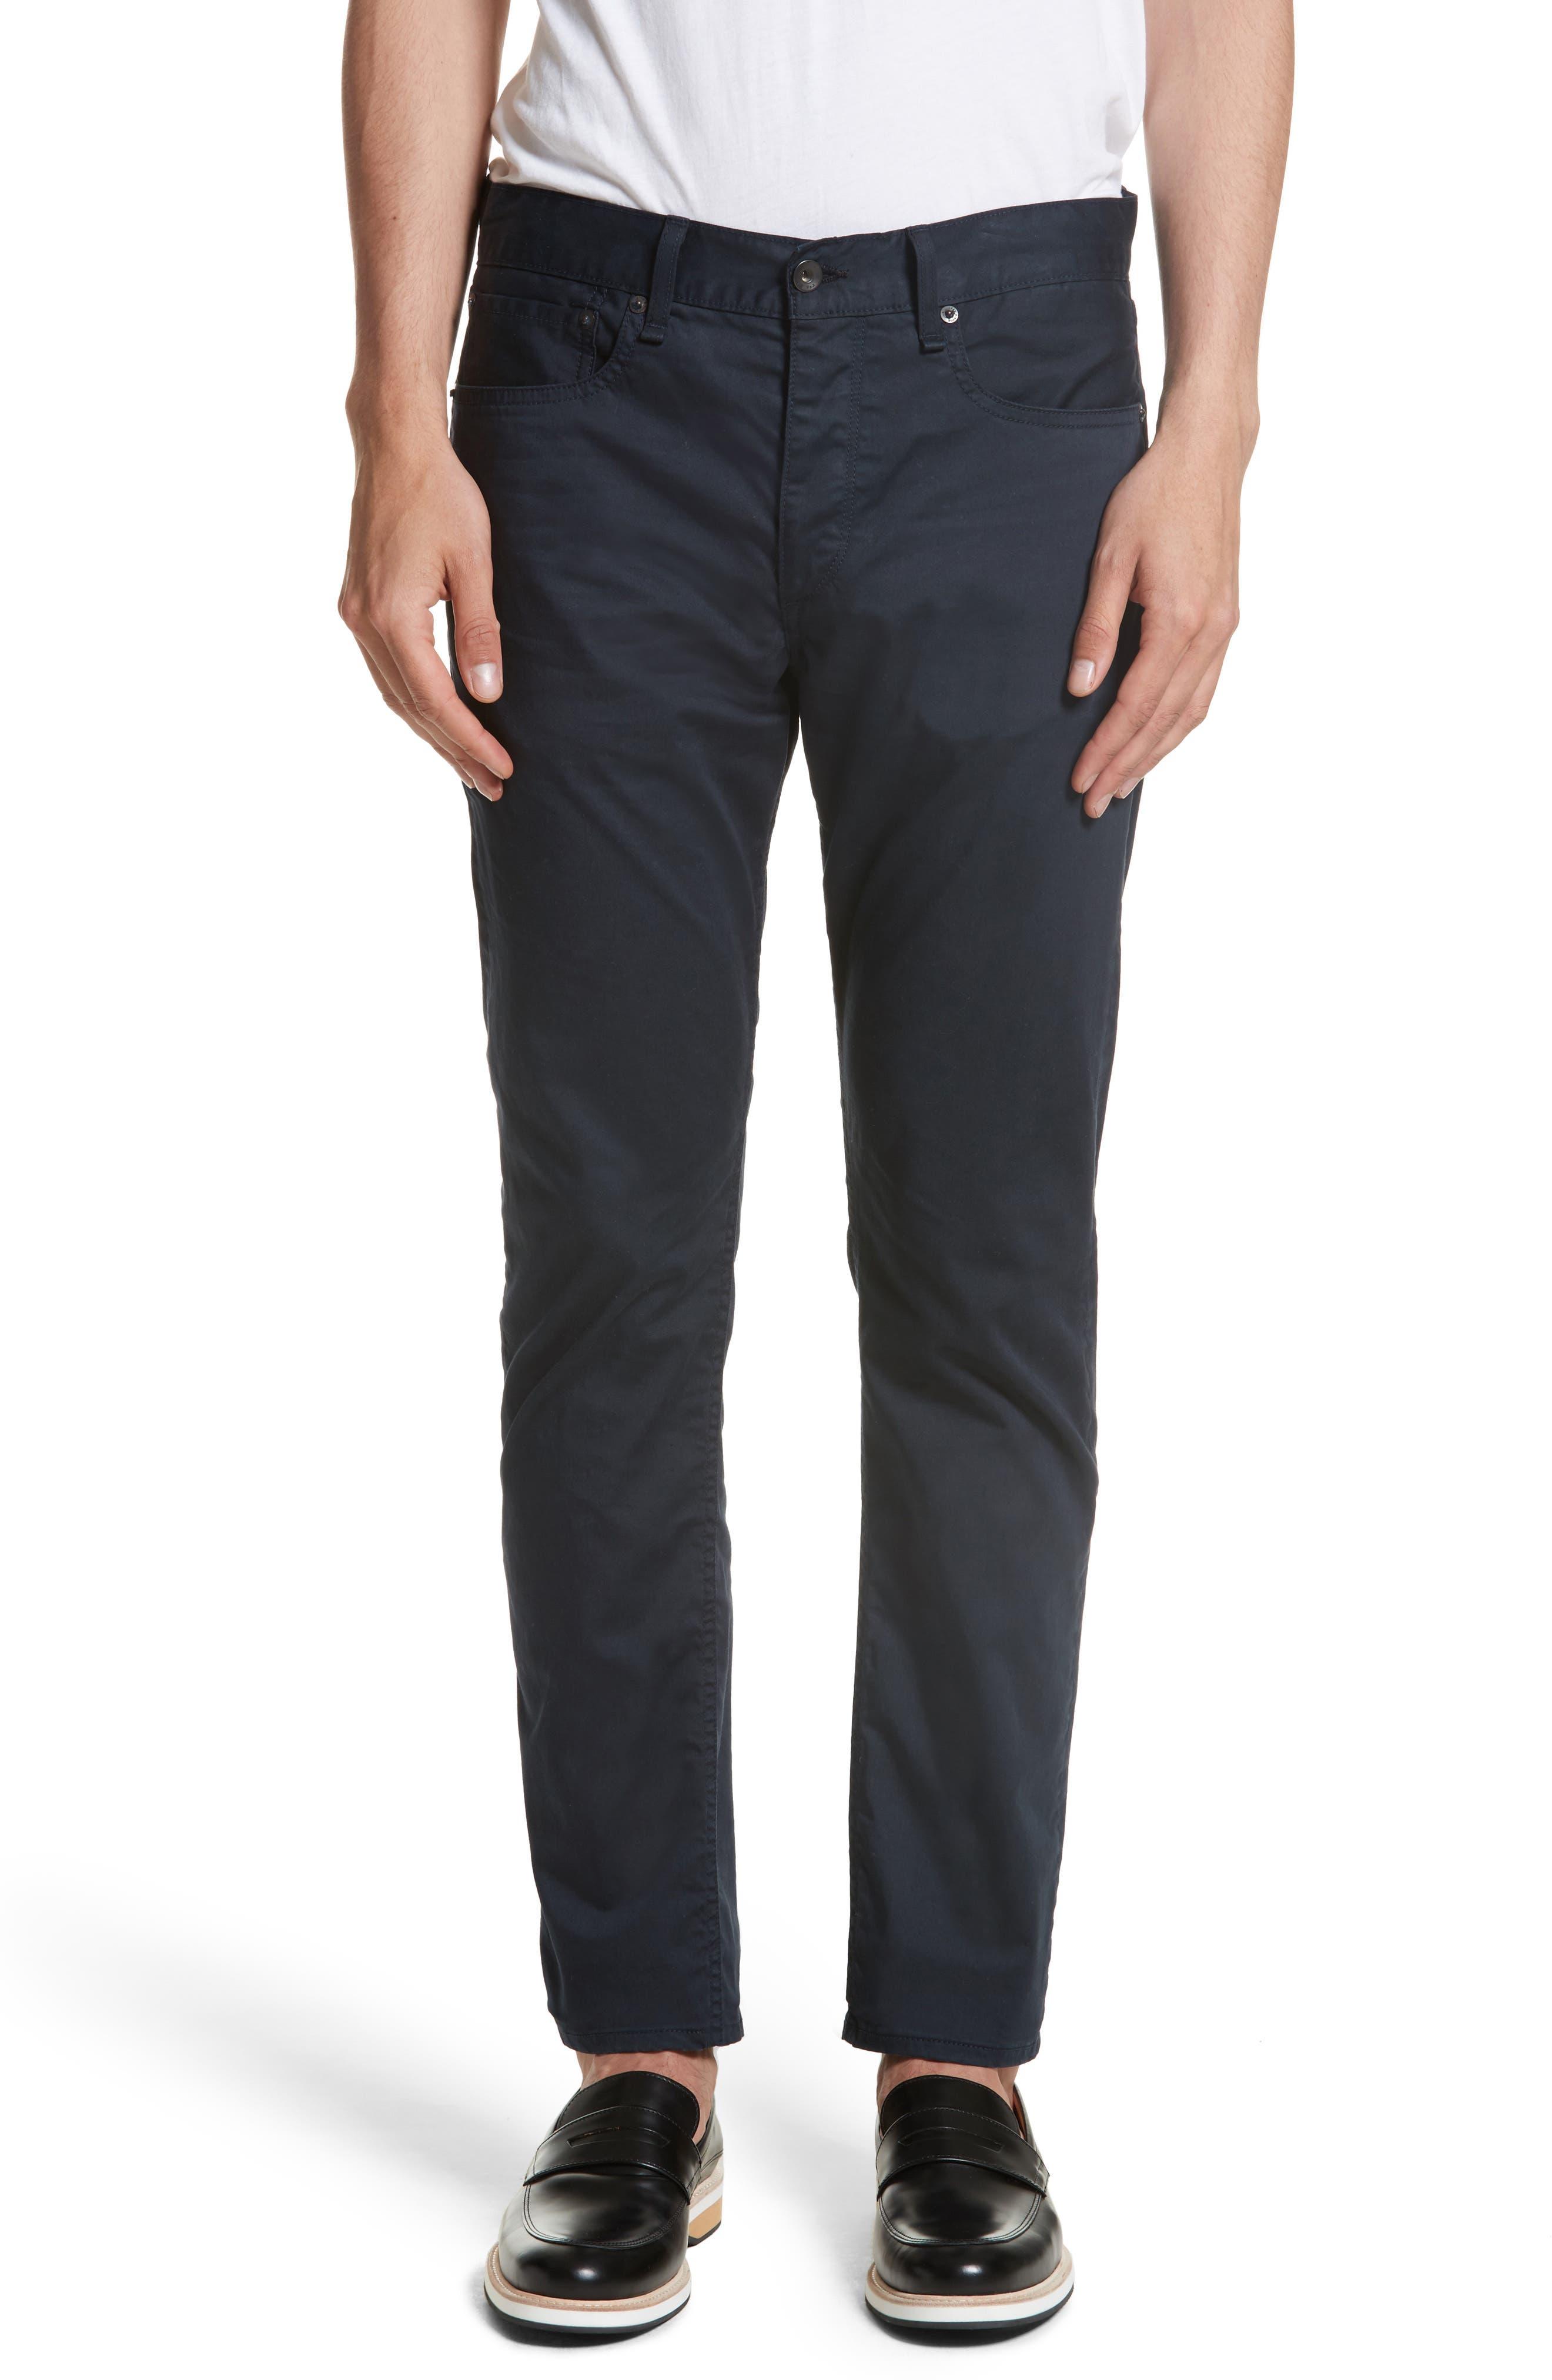 Fit 2 Five-Pocket Twill Pants,                             Main thumbnail 1, color,                             410